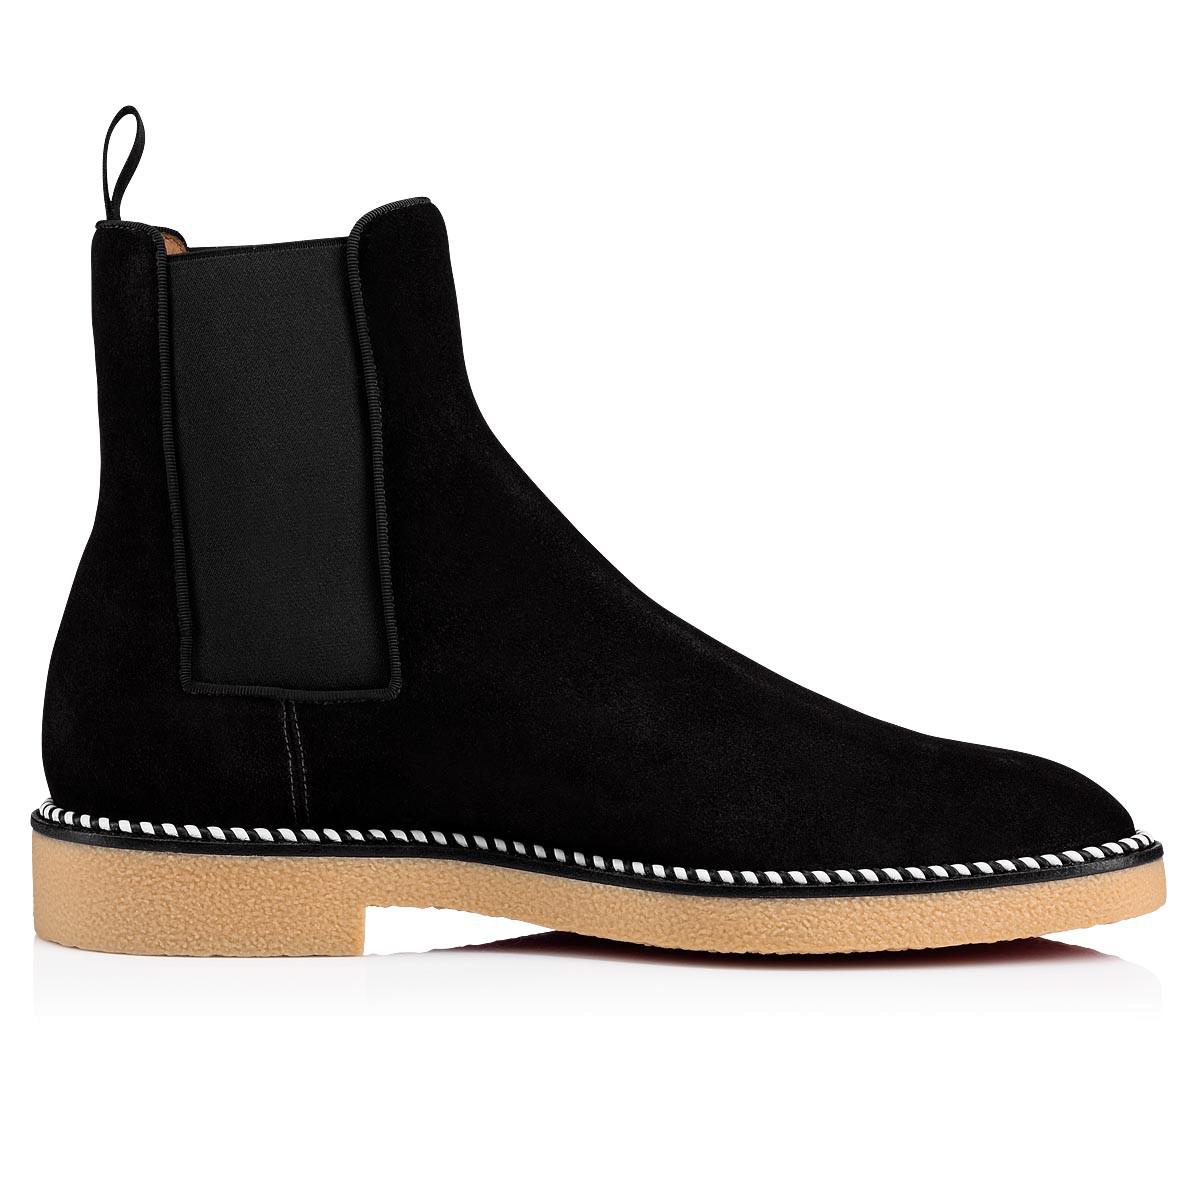 3f3488a30e5 Men's Chelsea Crepe-Sole Suede Boots in Black